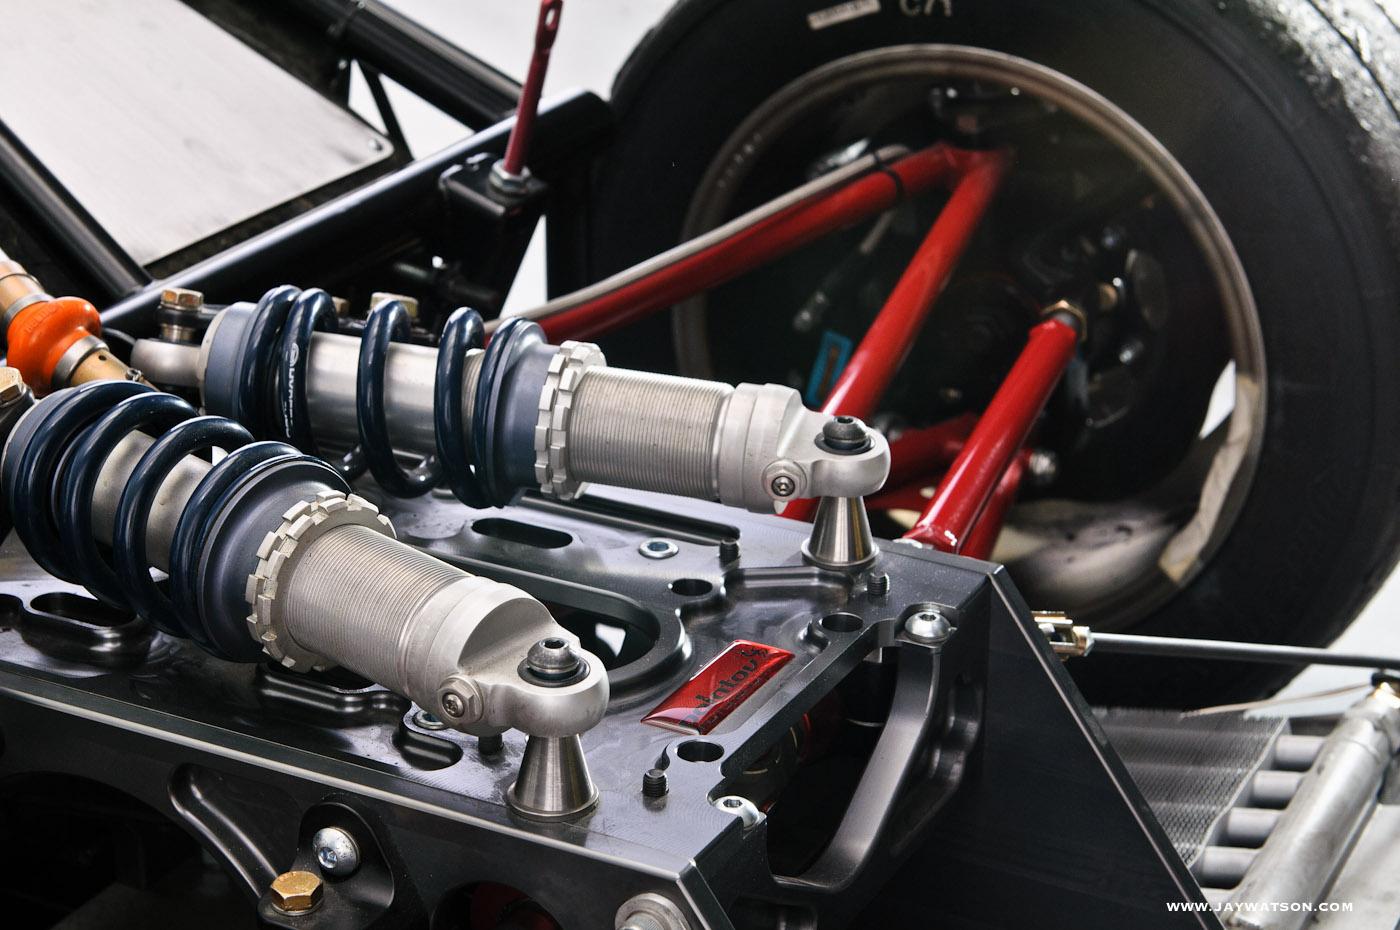 About Us - Palatov MotorsportPalatov Motorsport